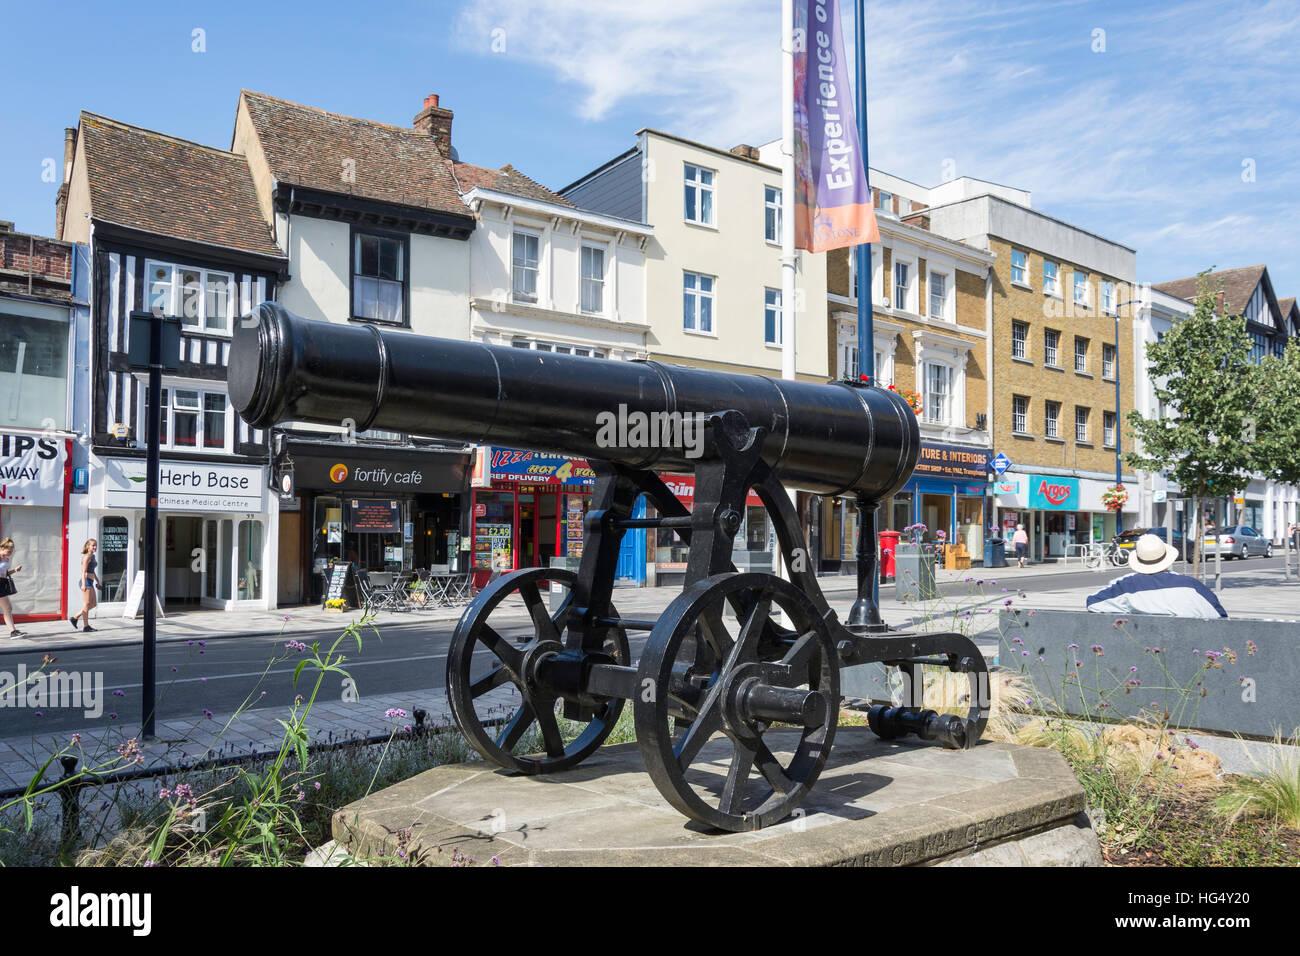 Canon in Rememberance Square, Maidstone, Kent, England, United Kingdom - Stock Image